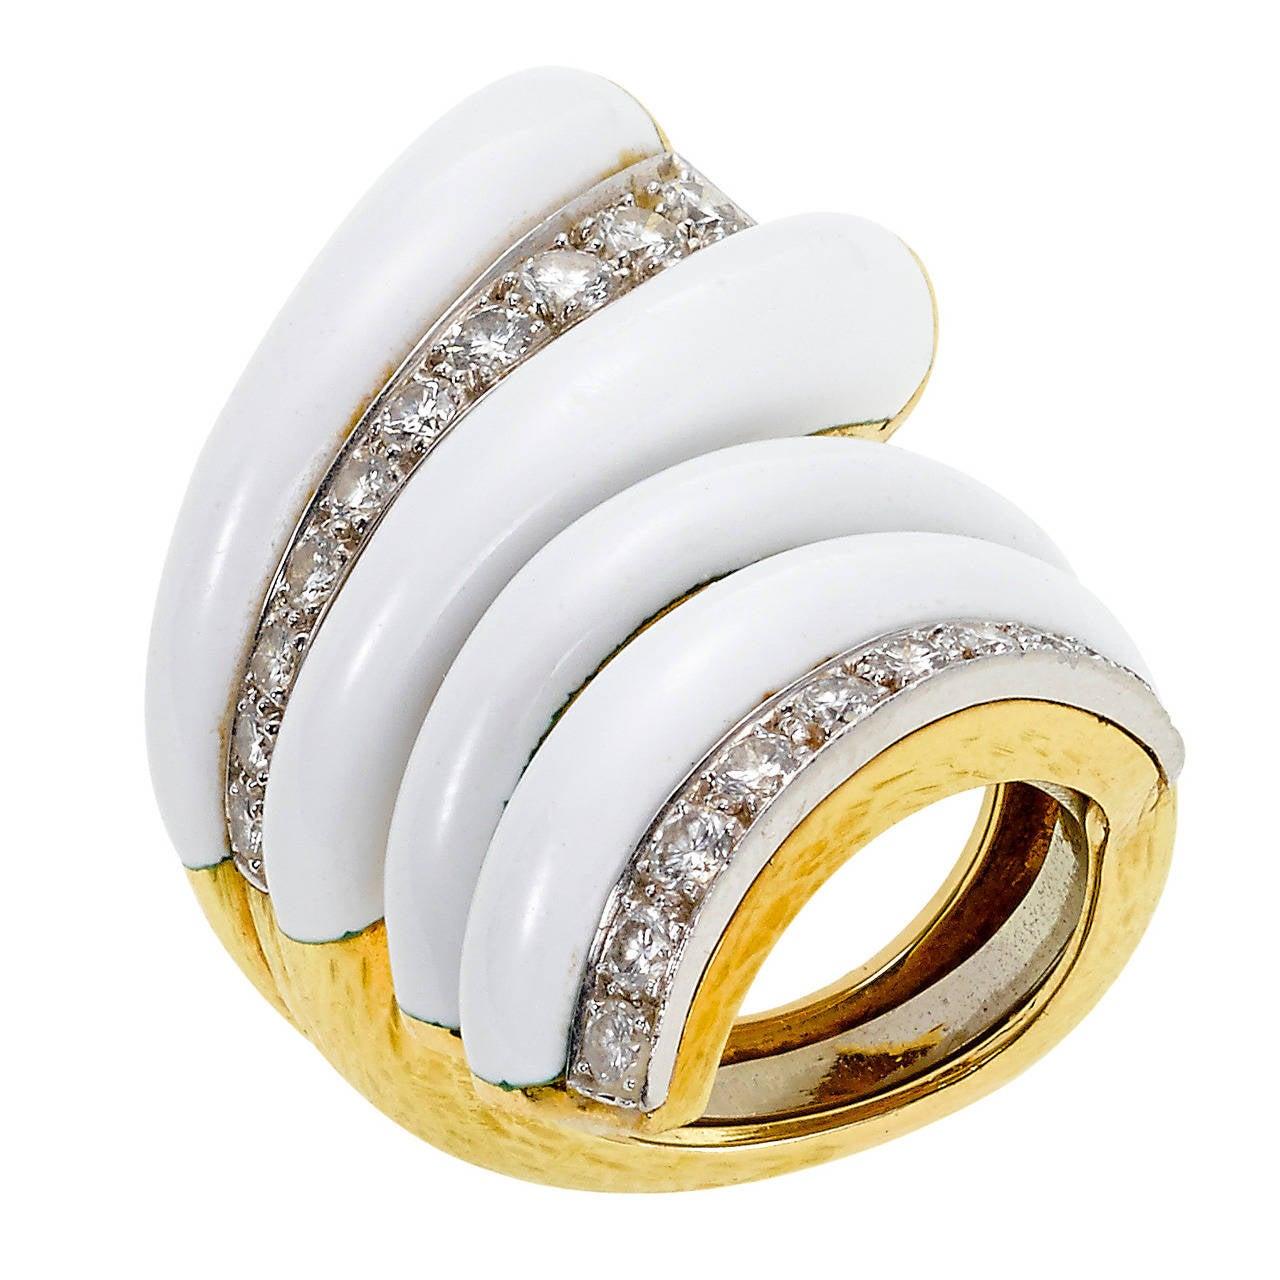 david webb enamel gold cocktail ring at 1stdibs